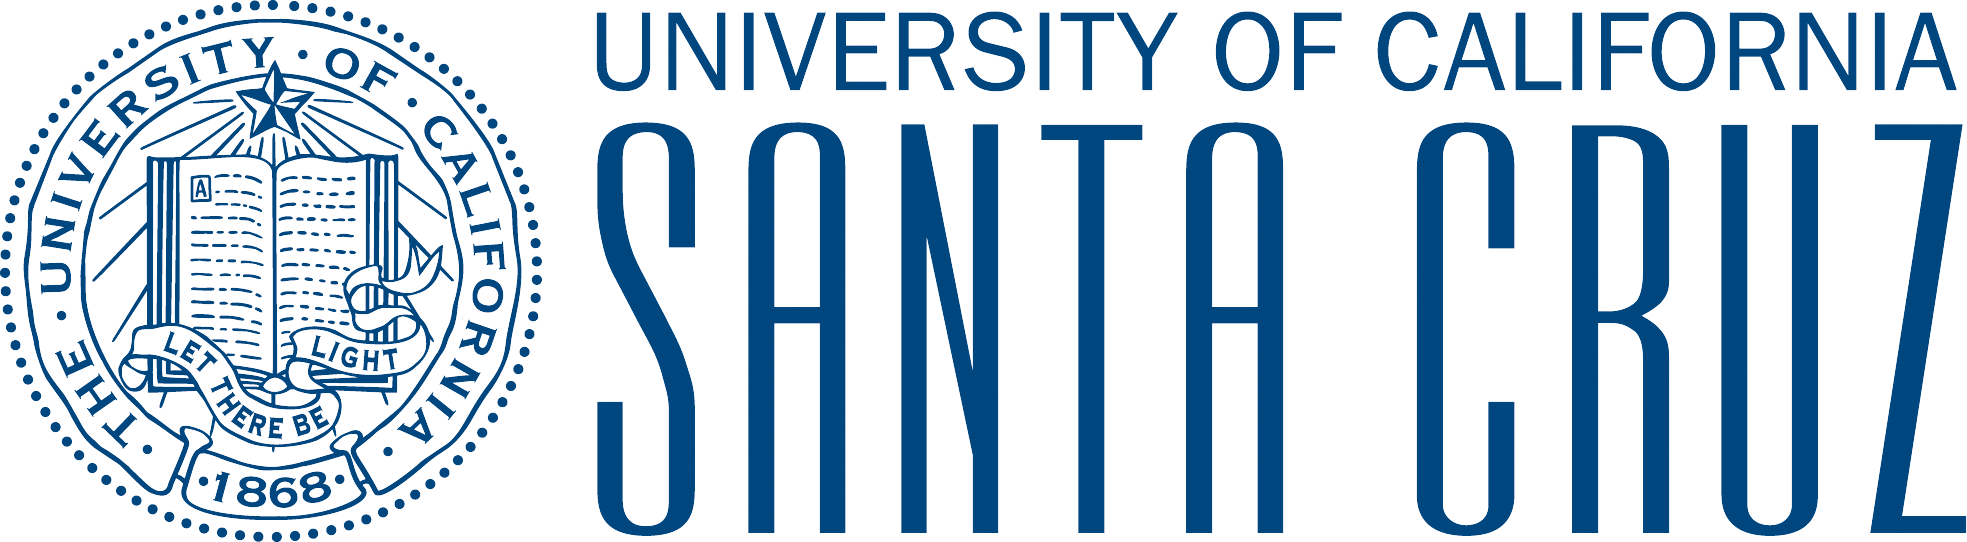 UC Santa Cruz Transparent Logo Large.